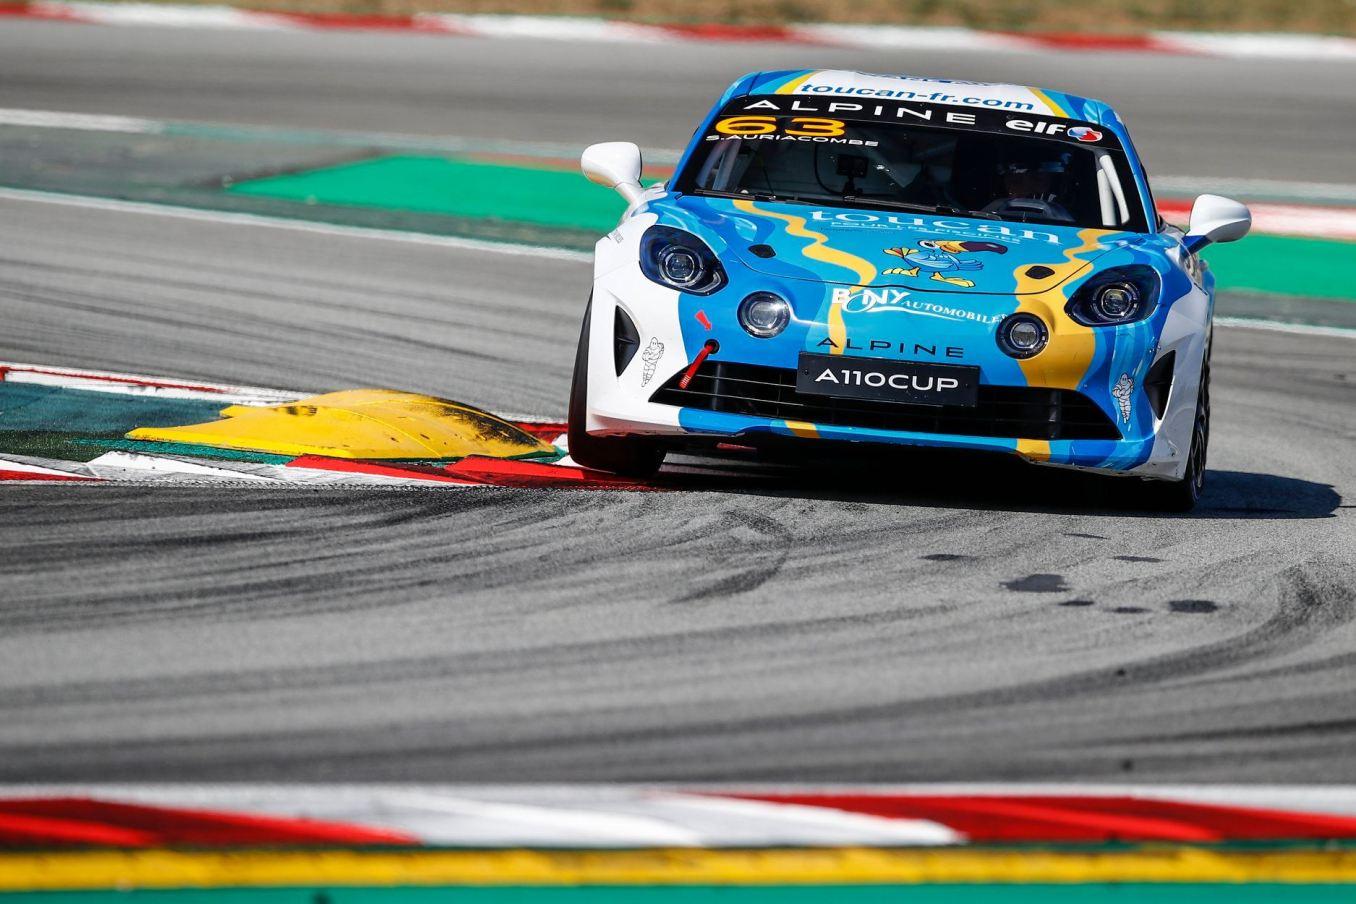 Alpine Elf Europa Cup A110 Barcelona Catalunya 2021 10   Alpine Elf Europa Cup : Victoire pour Tirman et Mela sur le Circuit de Barcelona-Catalunya 2021